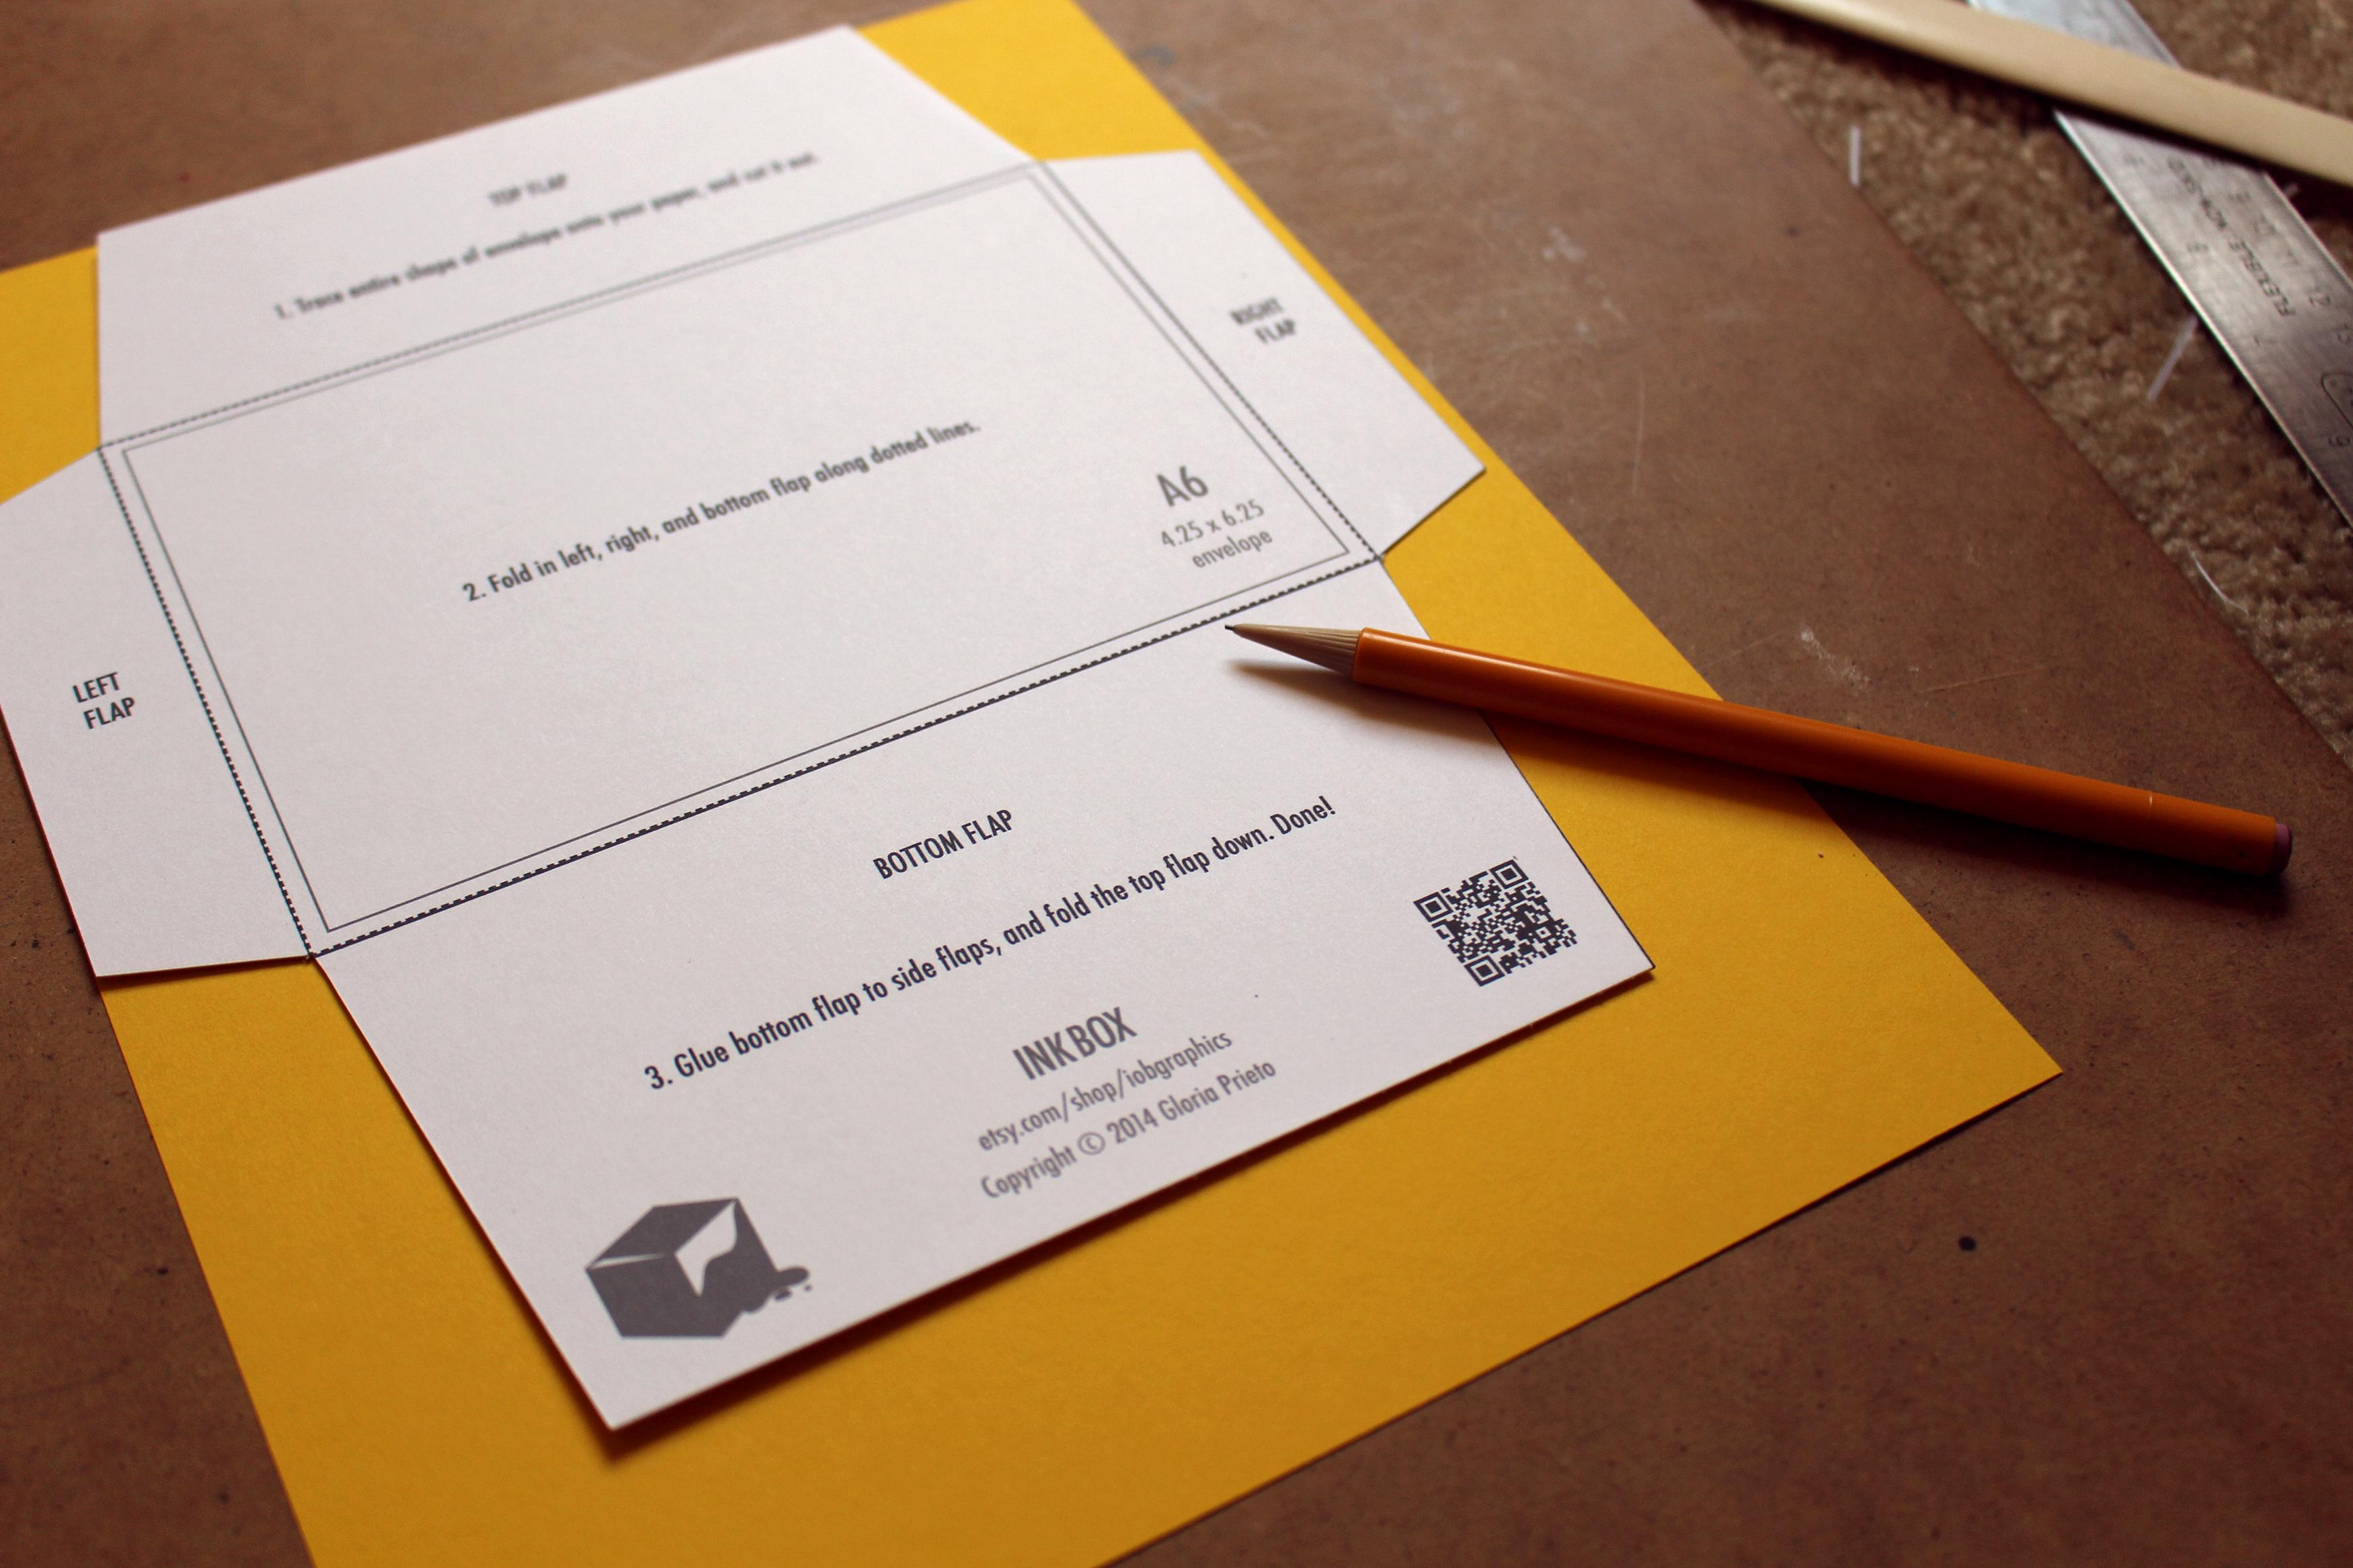 gloria prieto free printable 4 25 x 6 25 envelope template design